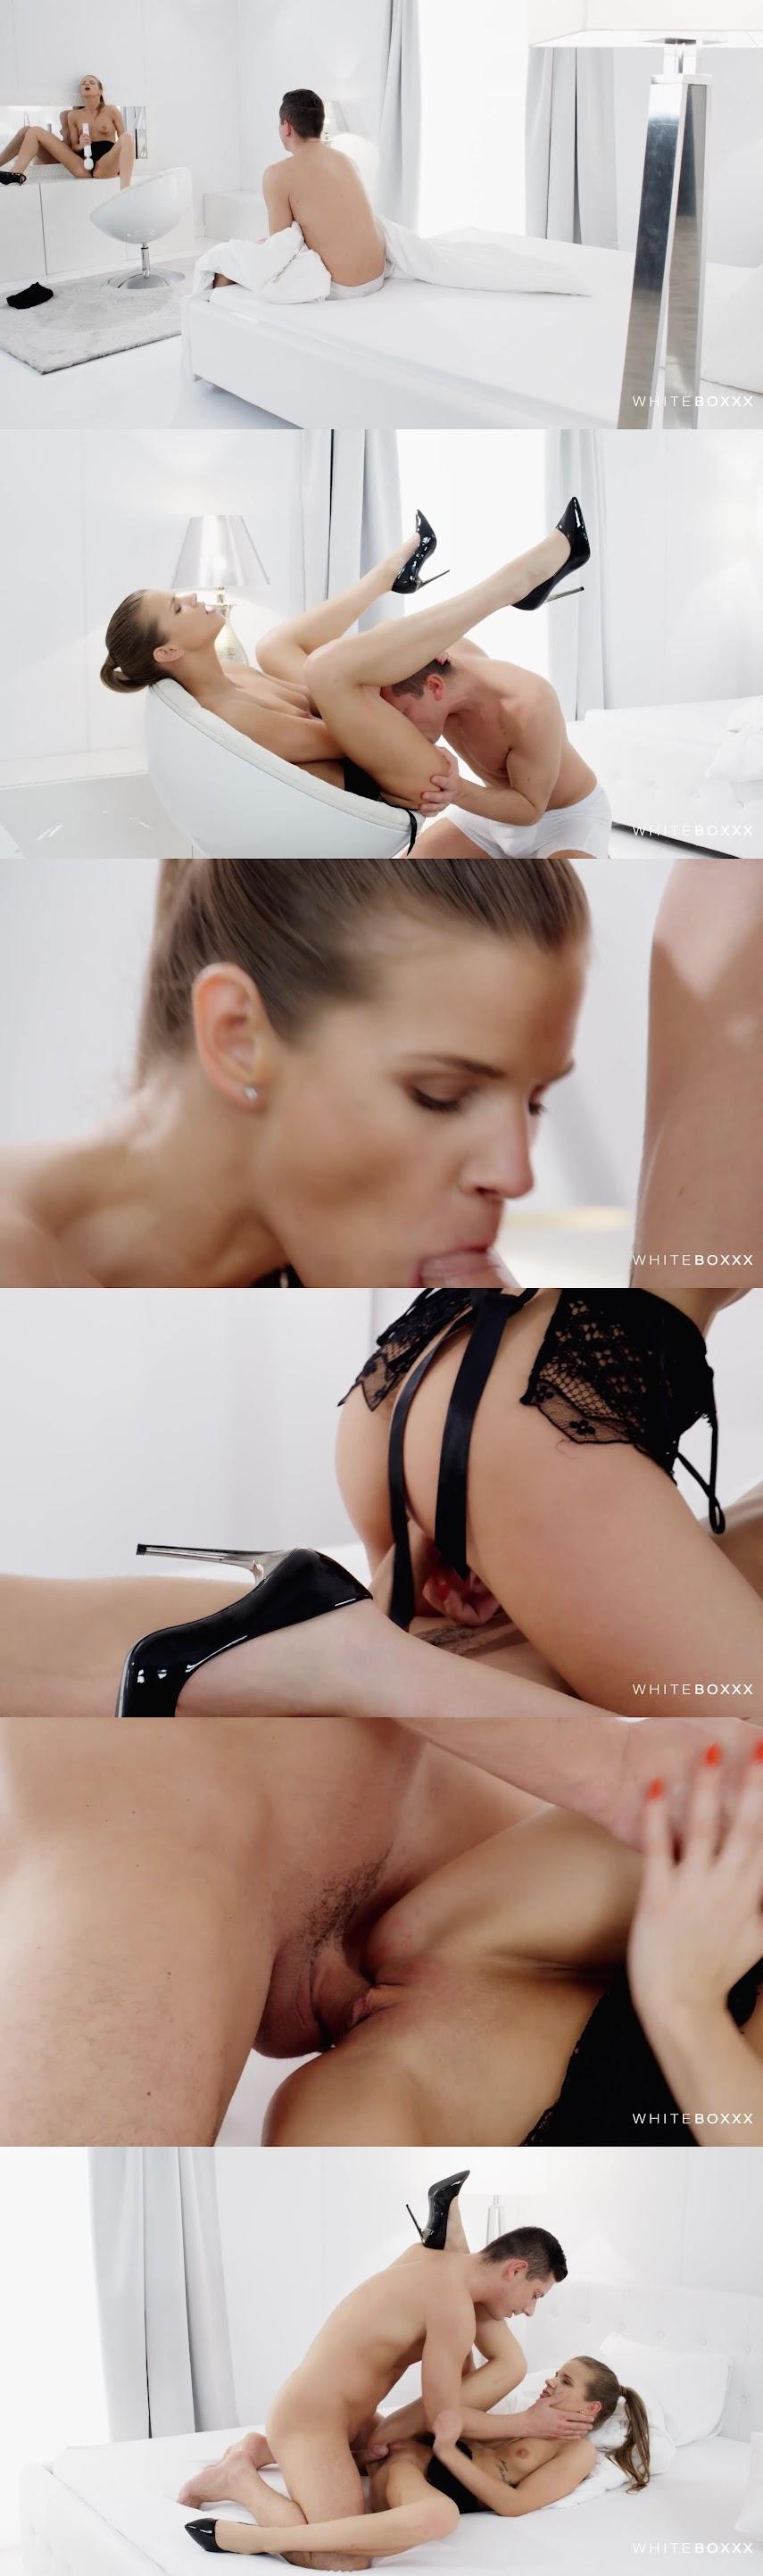 thewhiteboxxx 20.08.14.sarah.kay.lovely.girlfriend.has.passionate.sex thewhiteboxxx.20.08.14.sarah.kay.lovely.girlfriend.has.passionate.sex.mp4-jk-